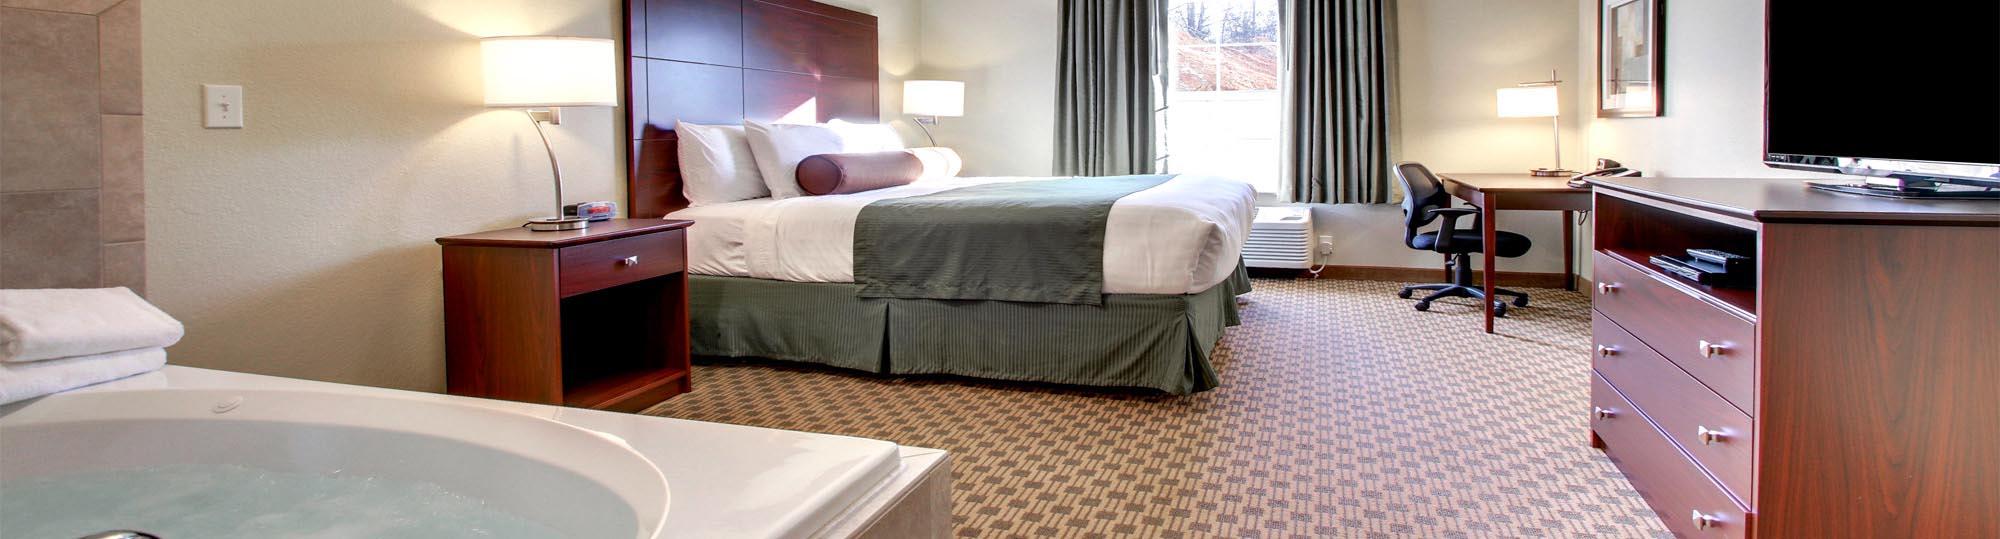 Cobblestone Hotel and Suites Salem